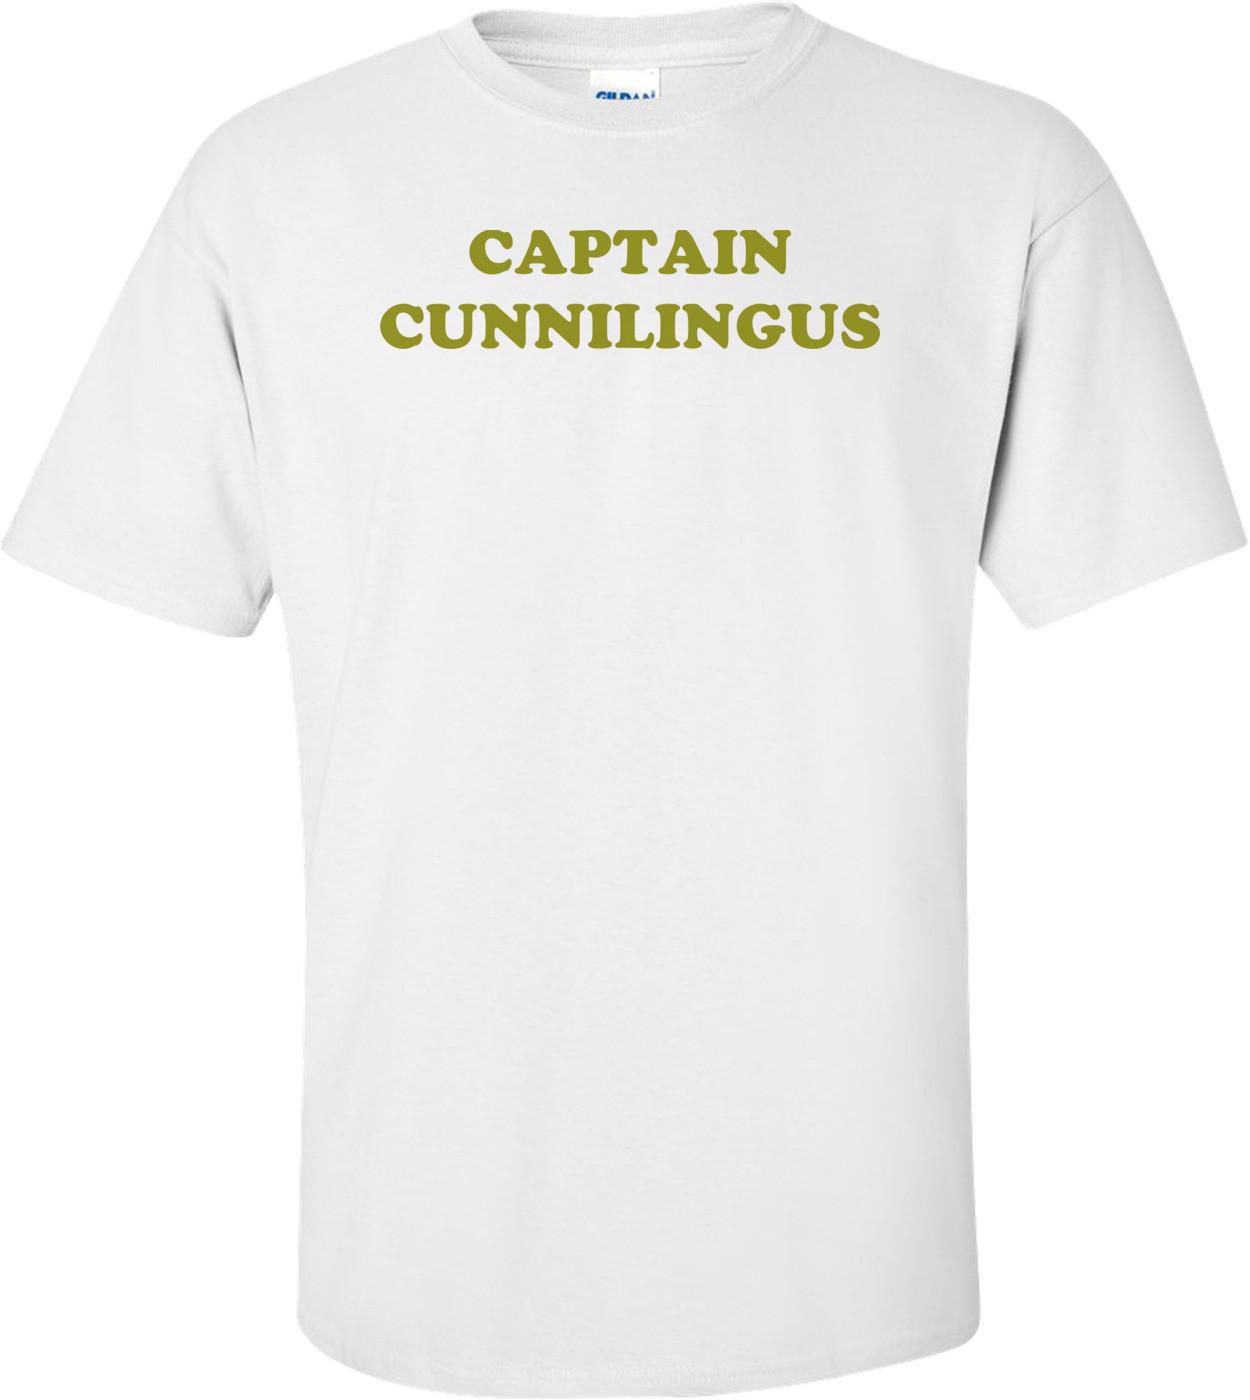 CAPTAIN CUNNILINGUS Shirt